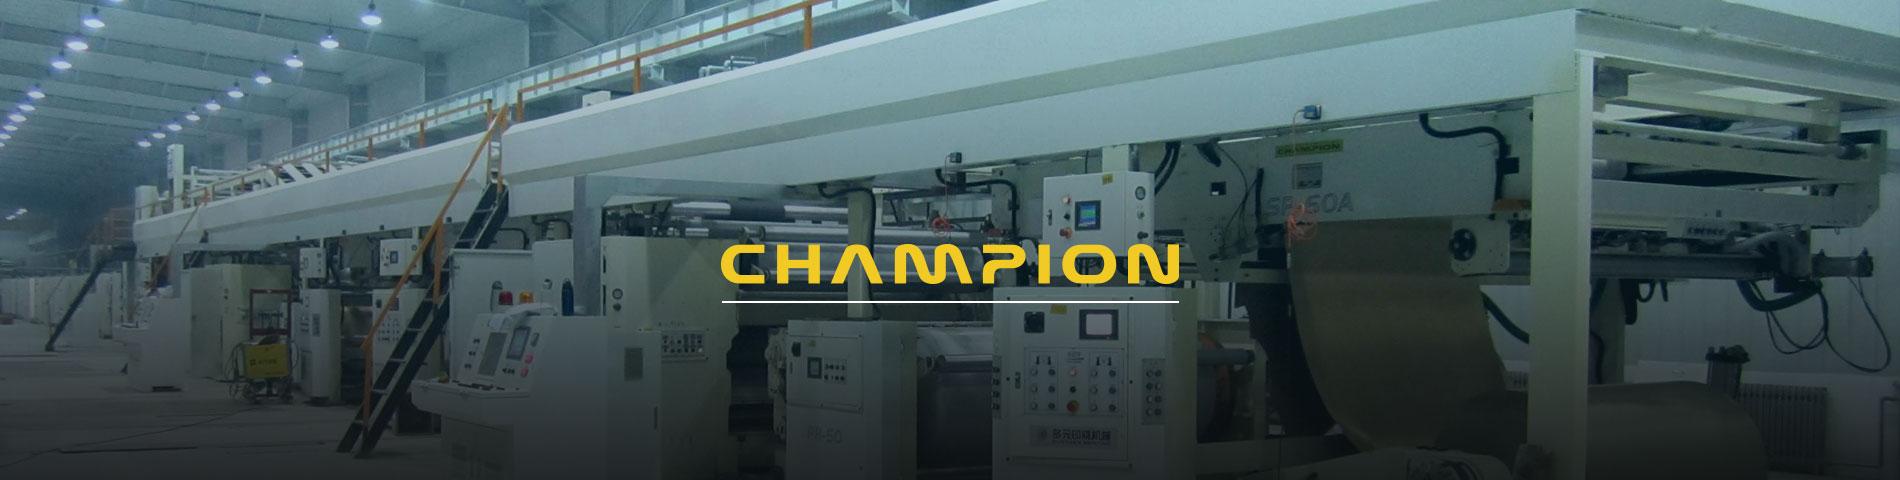 Champion Corrugated       adalah  Produsen Peralatan      Karton Bergelombang Profesional